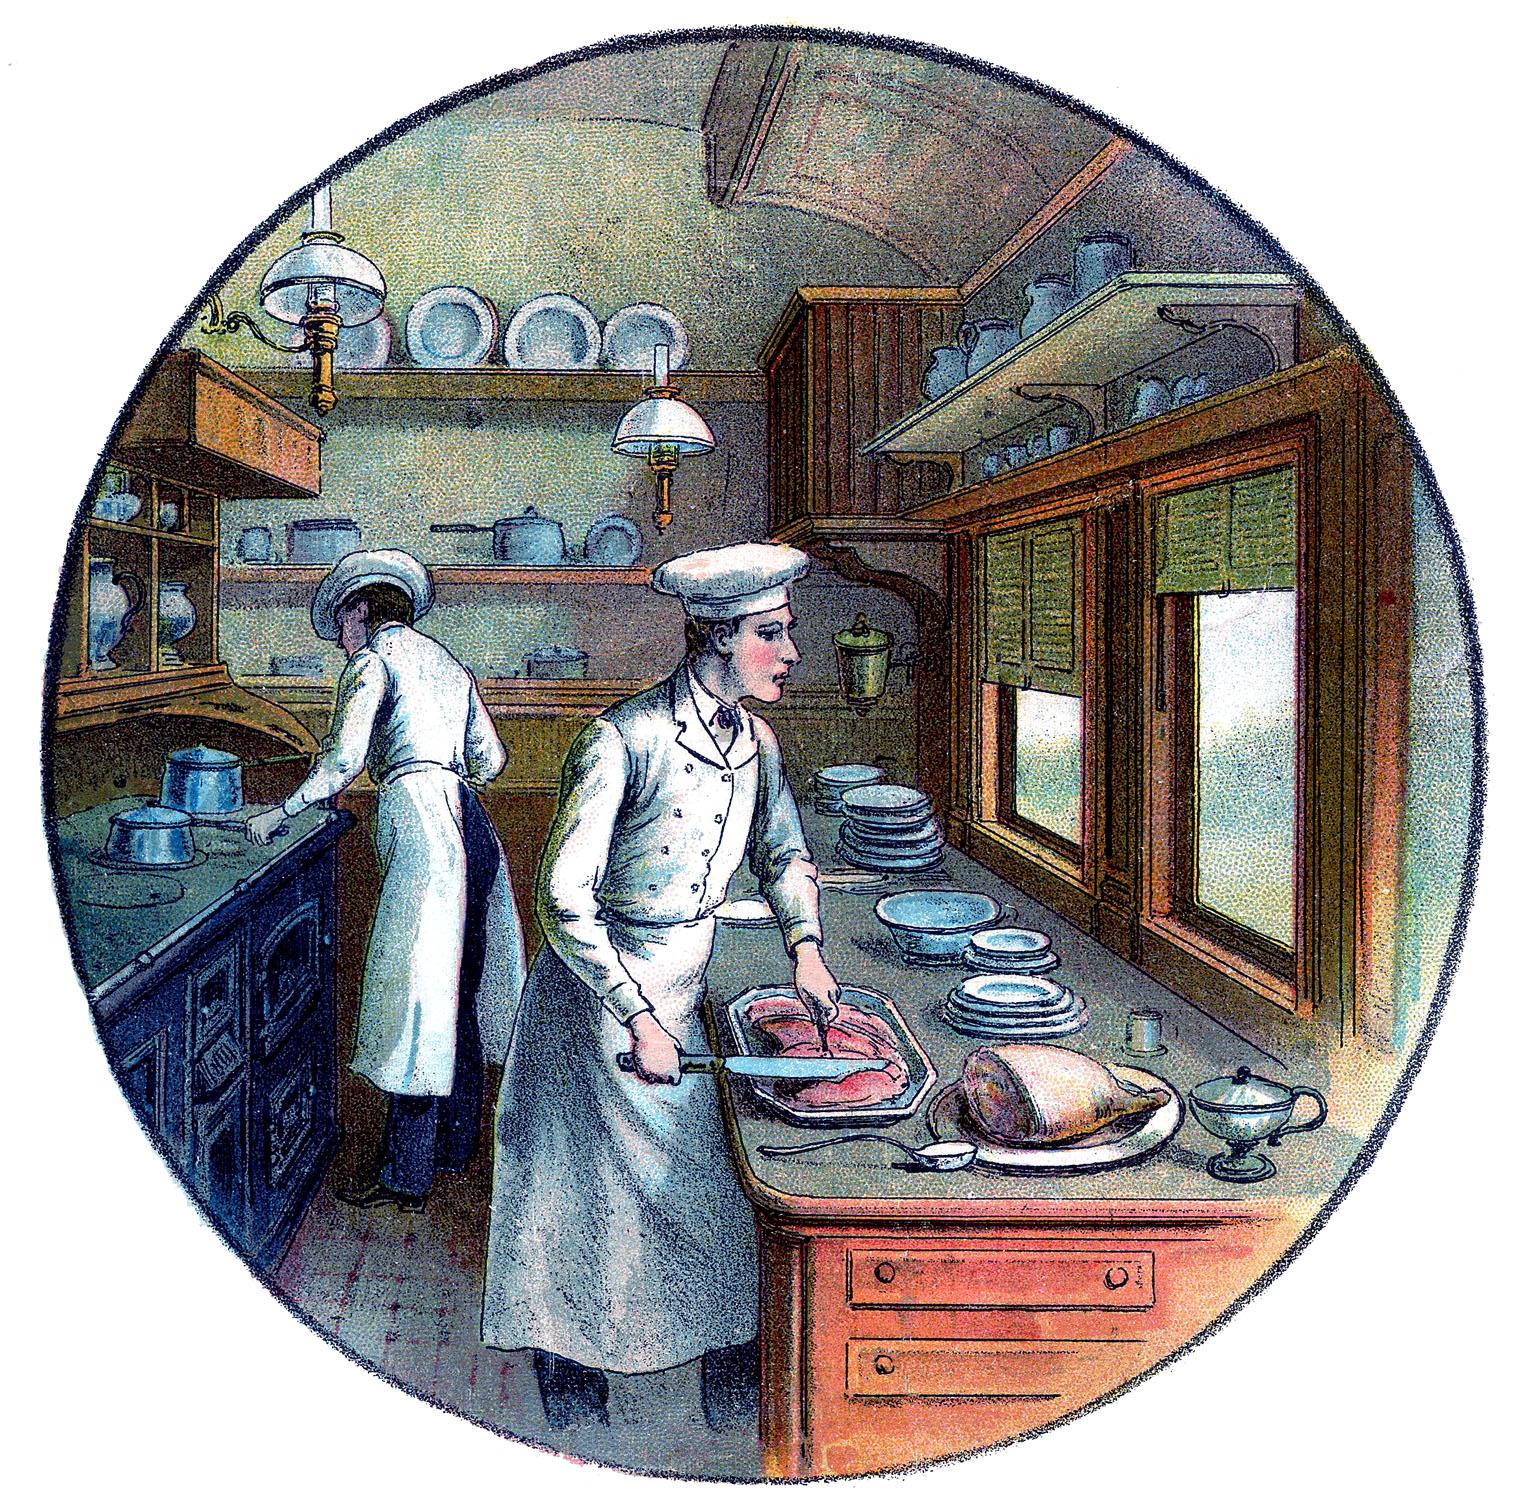 Vintage Cooking Images 2